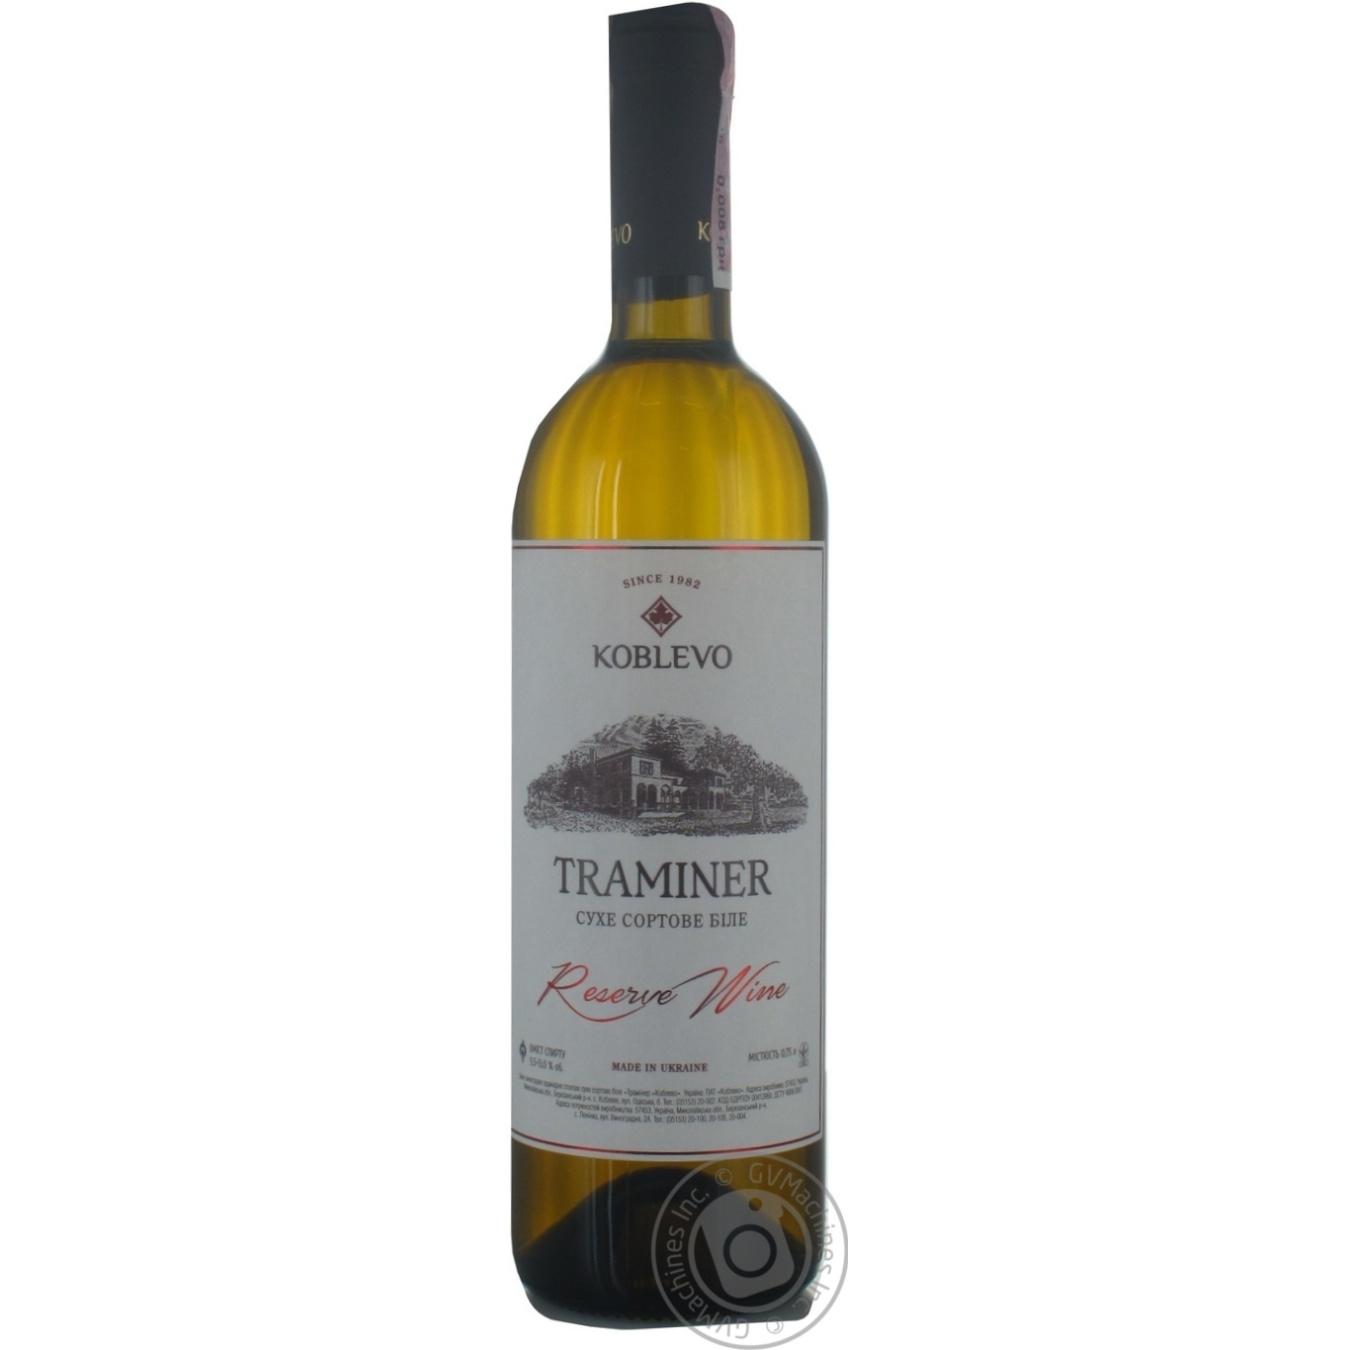 Купить Вино Коблево Трамінер Reserve Wine сухе сортове біле 13% 0, 75л